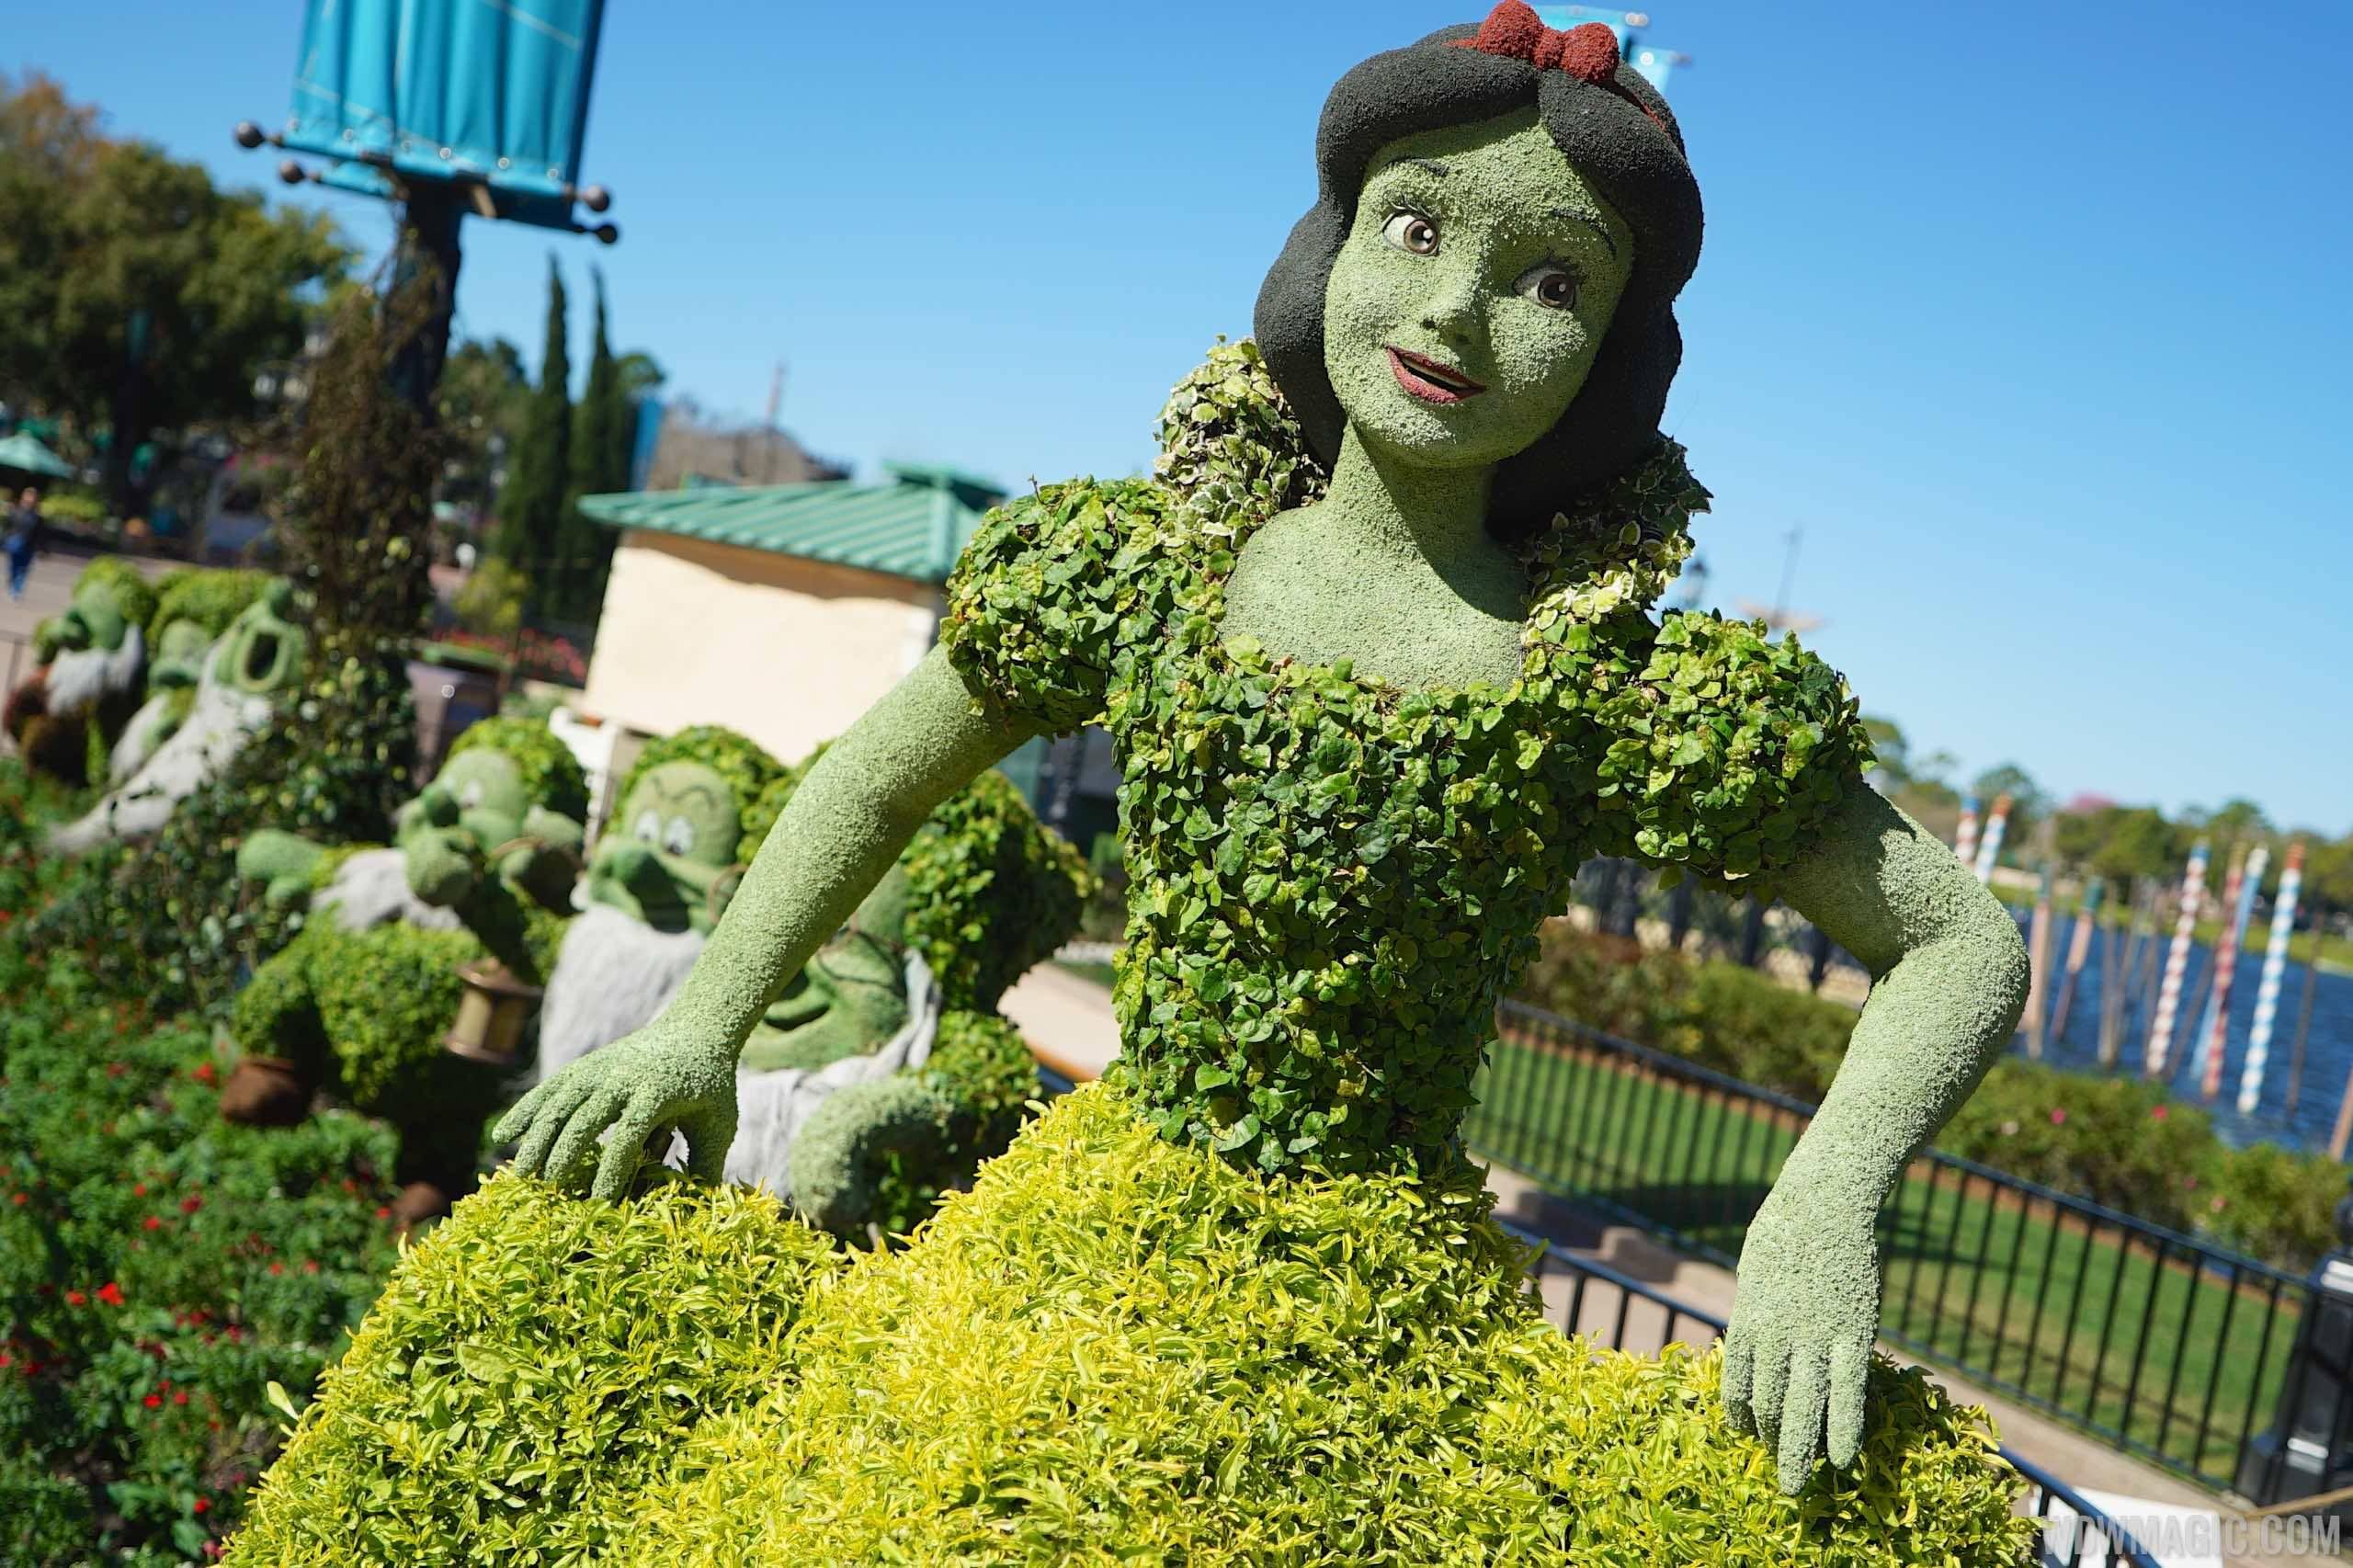 Epcot International Flower and Garden Festival overview